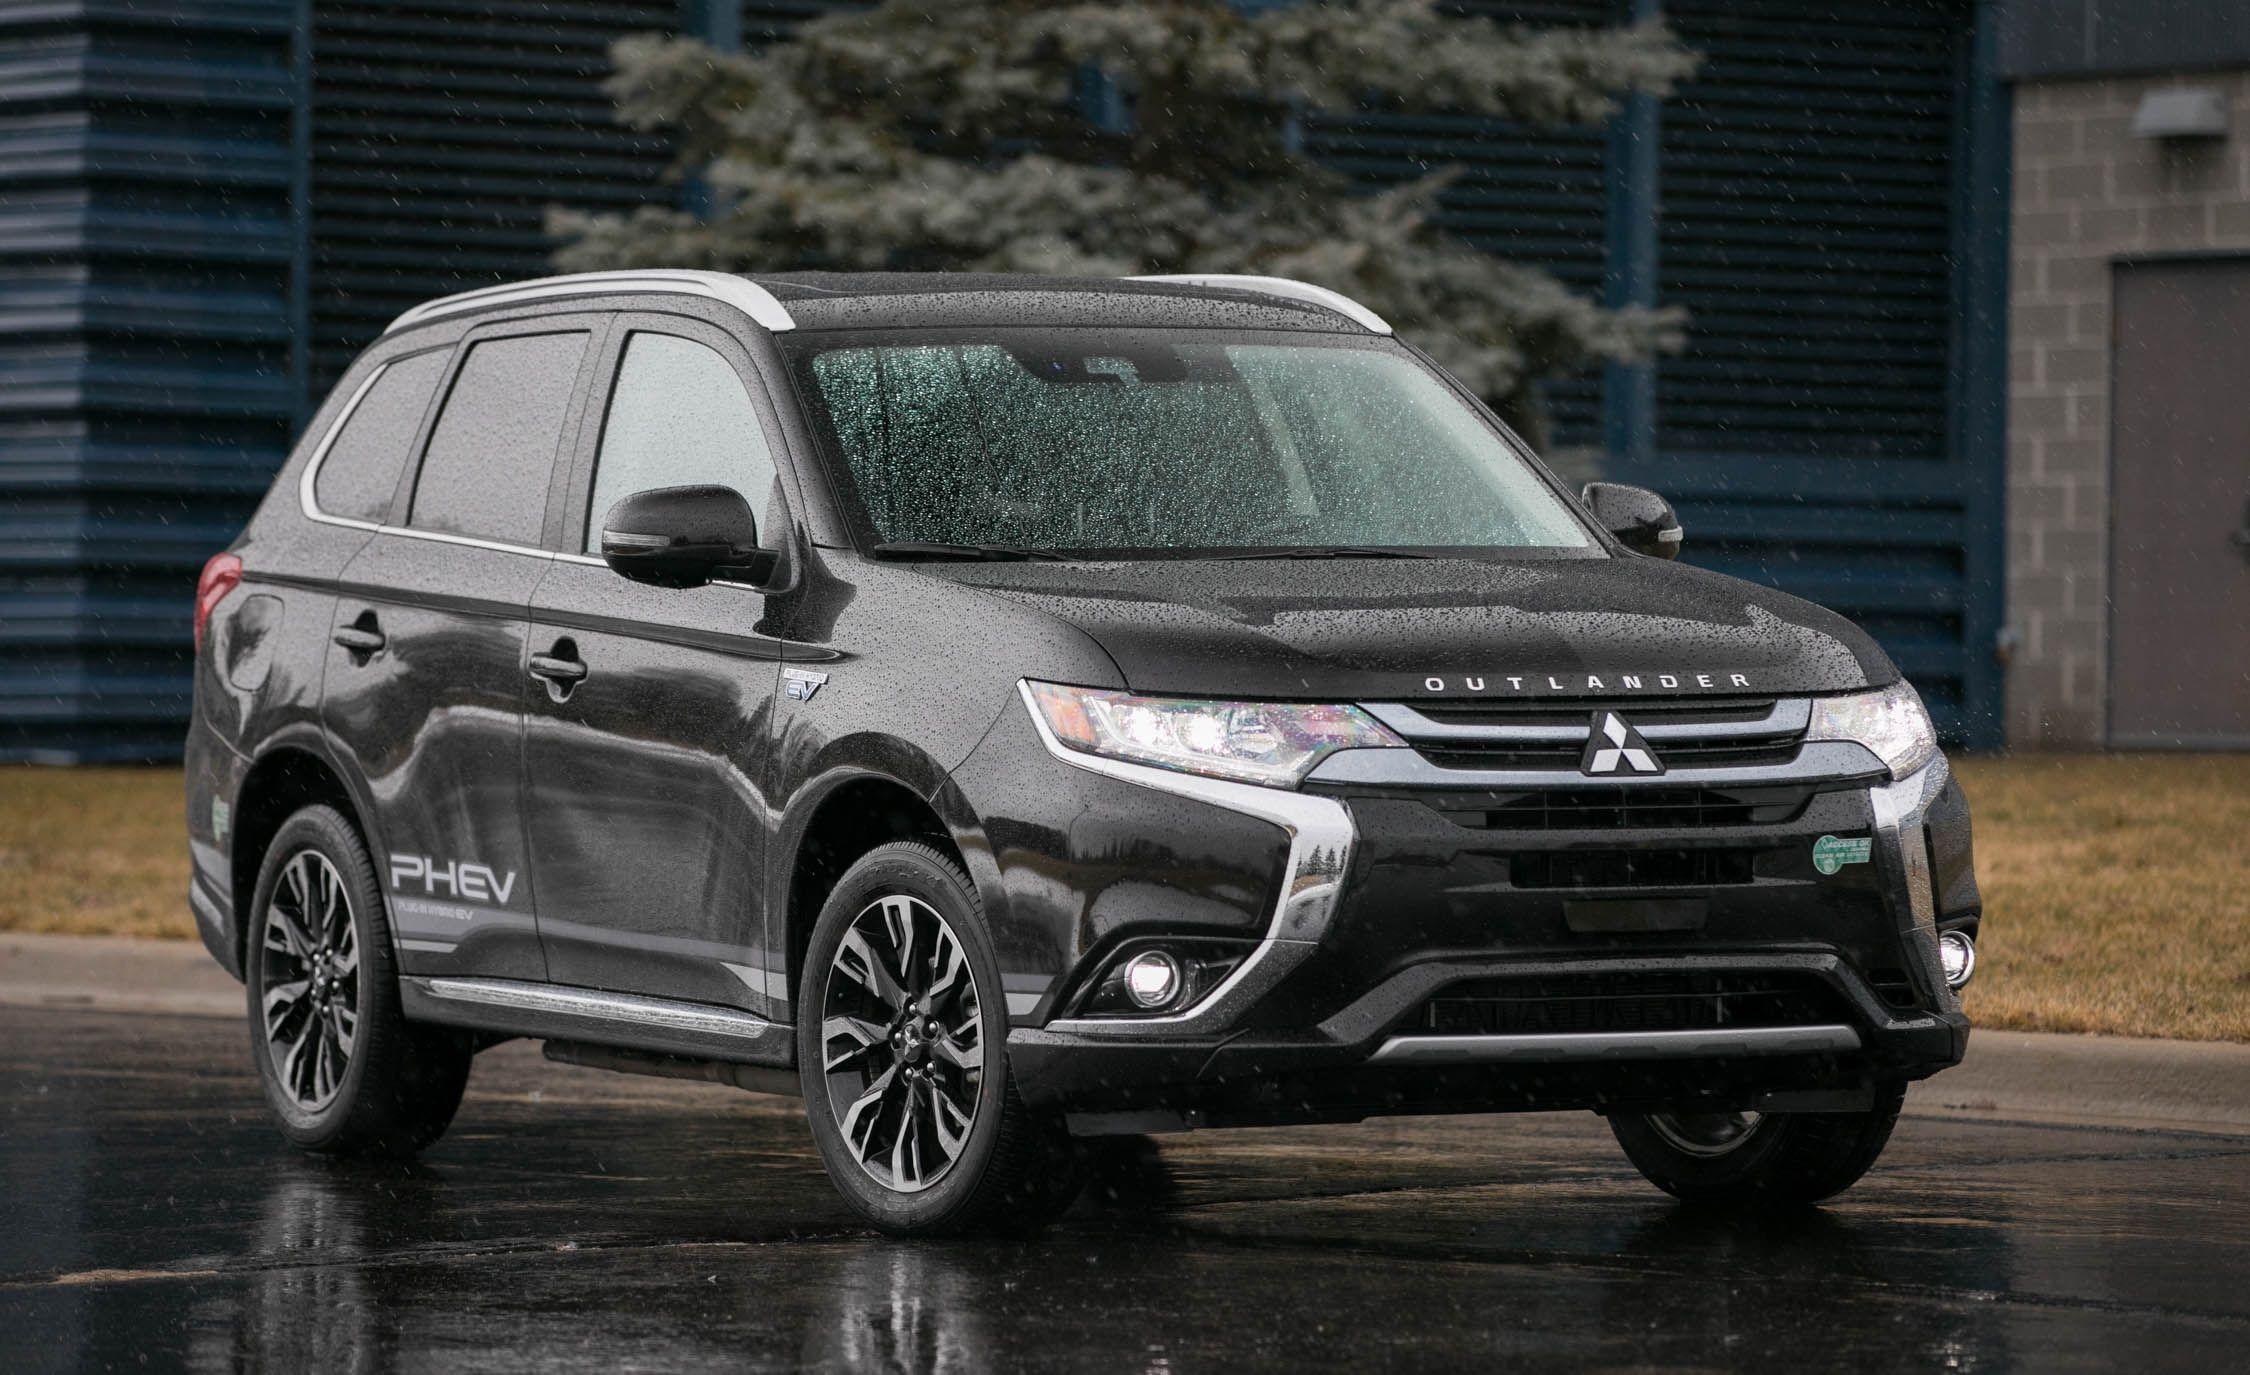 2019 Mitsubishi Outlander Reviews   Mitsubishi Outlander Price, Photos, and  Specs   Car and Driver